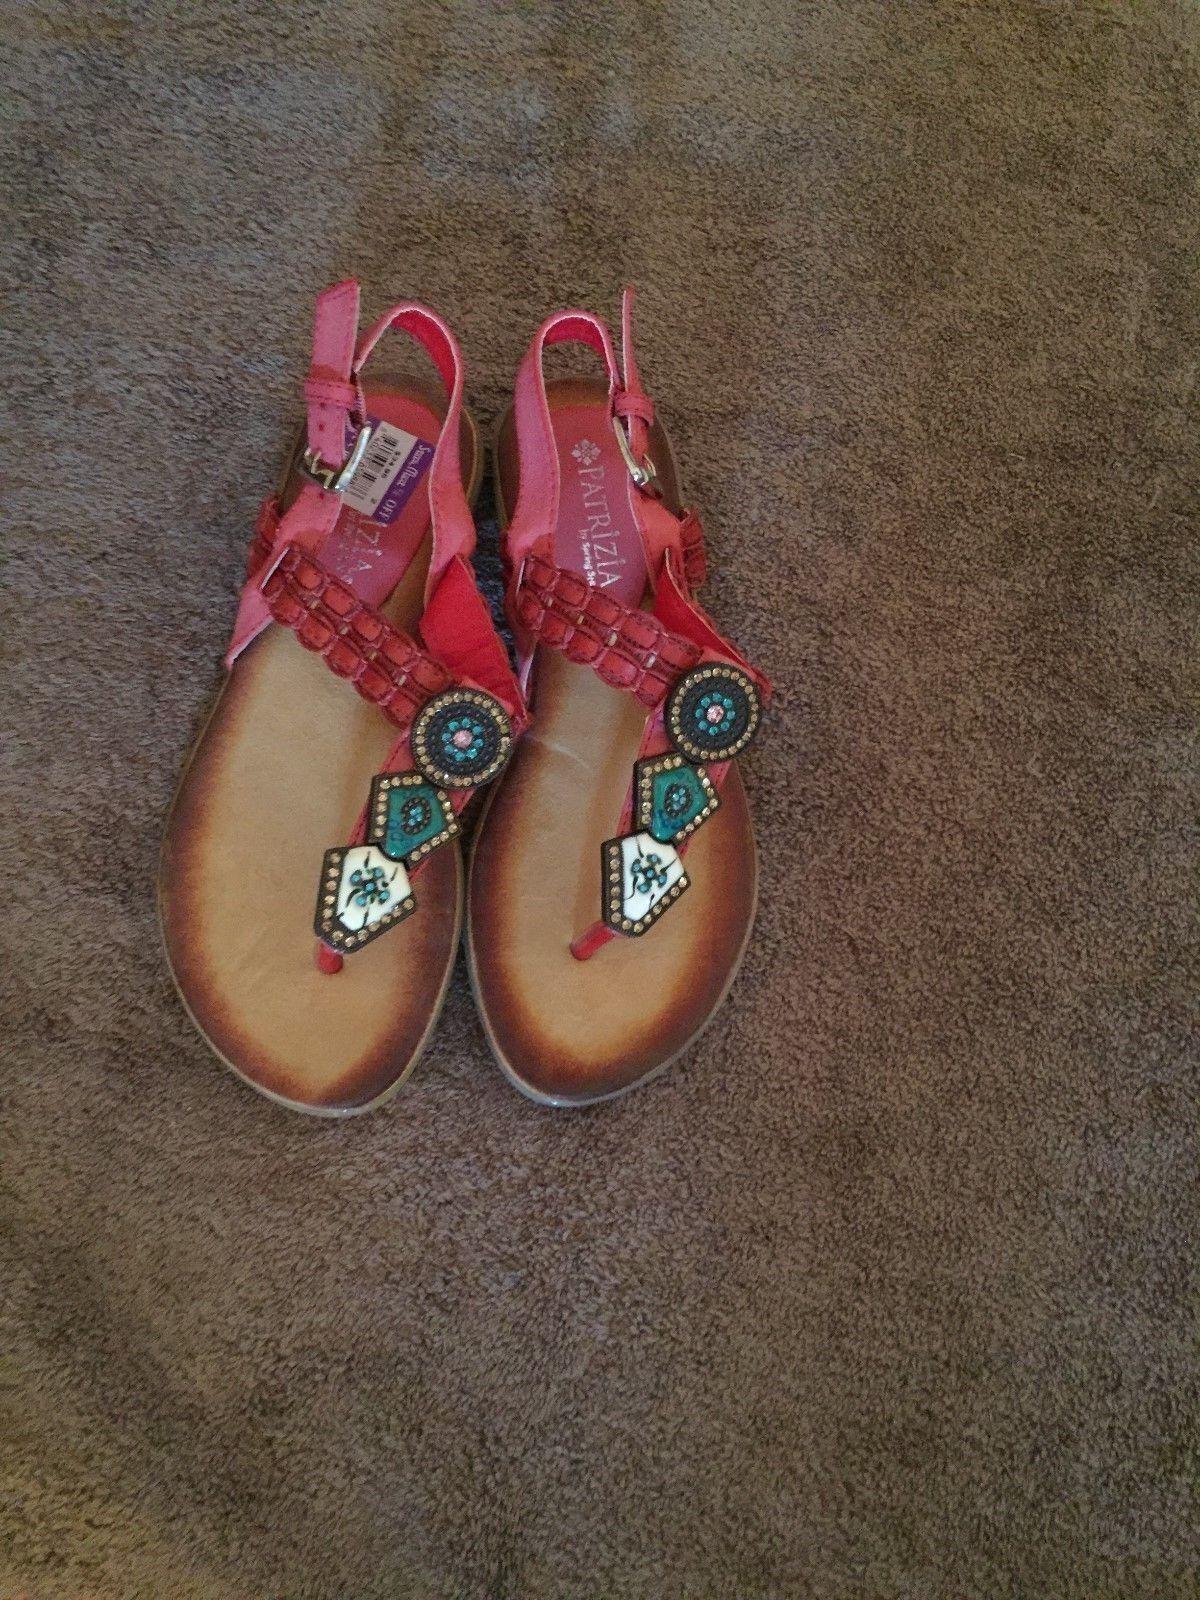 Ladies sandals Patrizia Red t strap sandals Ladies size 36 718fa3